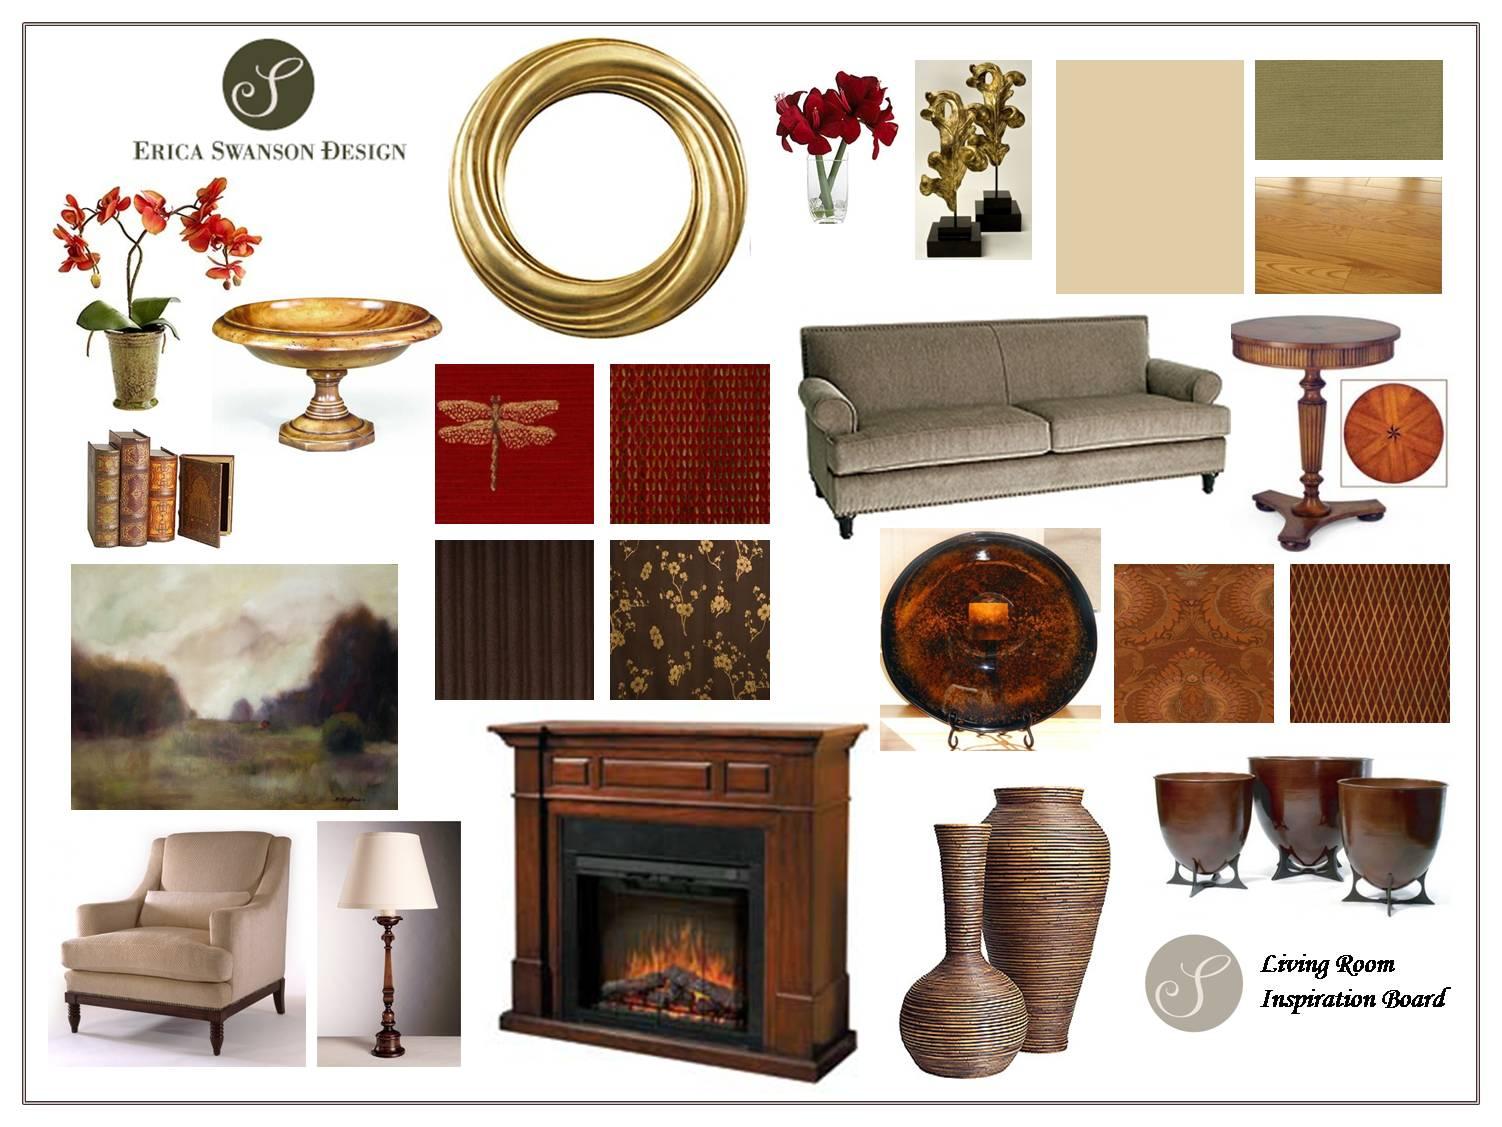 Inspiration Board - Living Room [2]